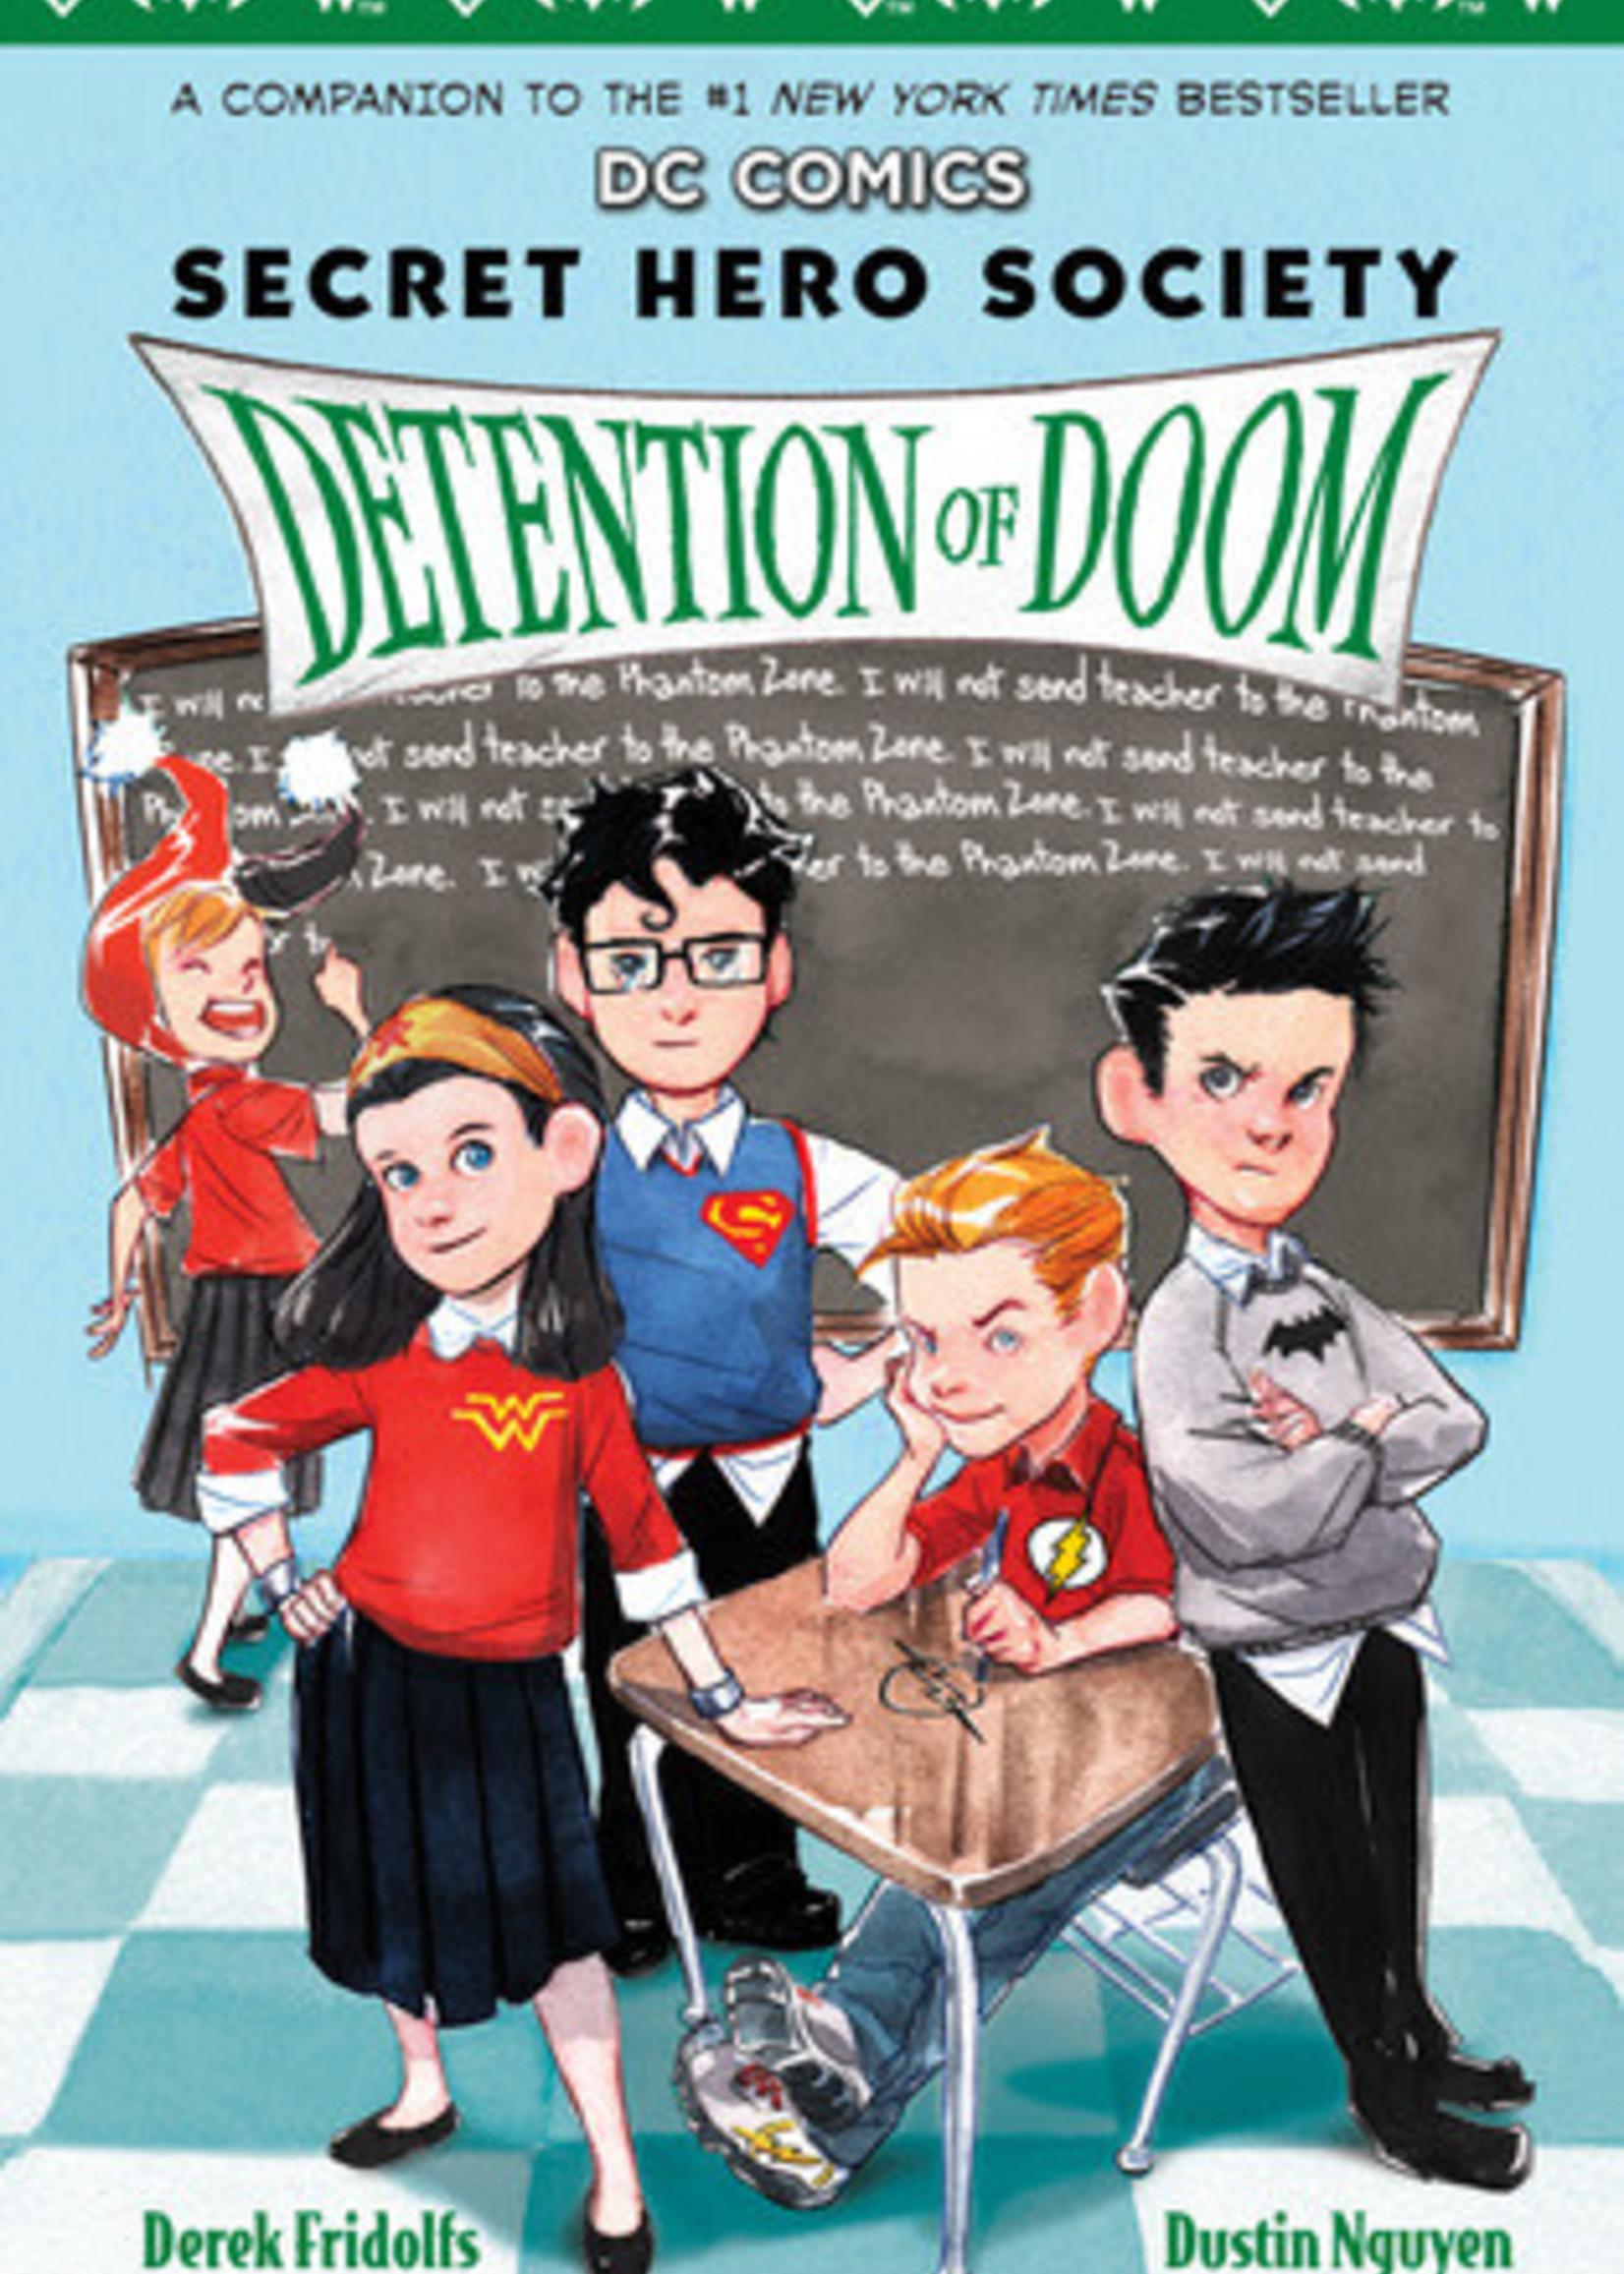 Detention of Doom (DC Comics: Secret Hero Society #3) by Derek Fridolfs,  Dustin Nguyen